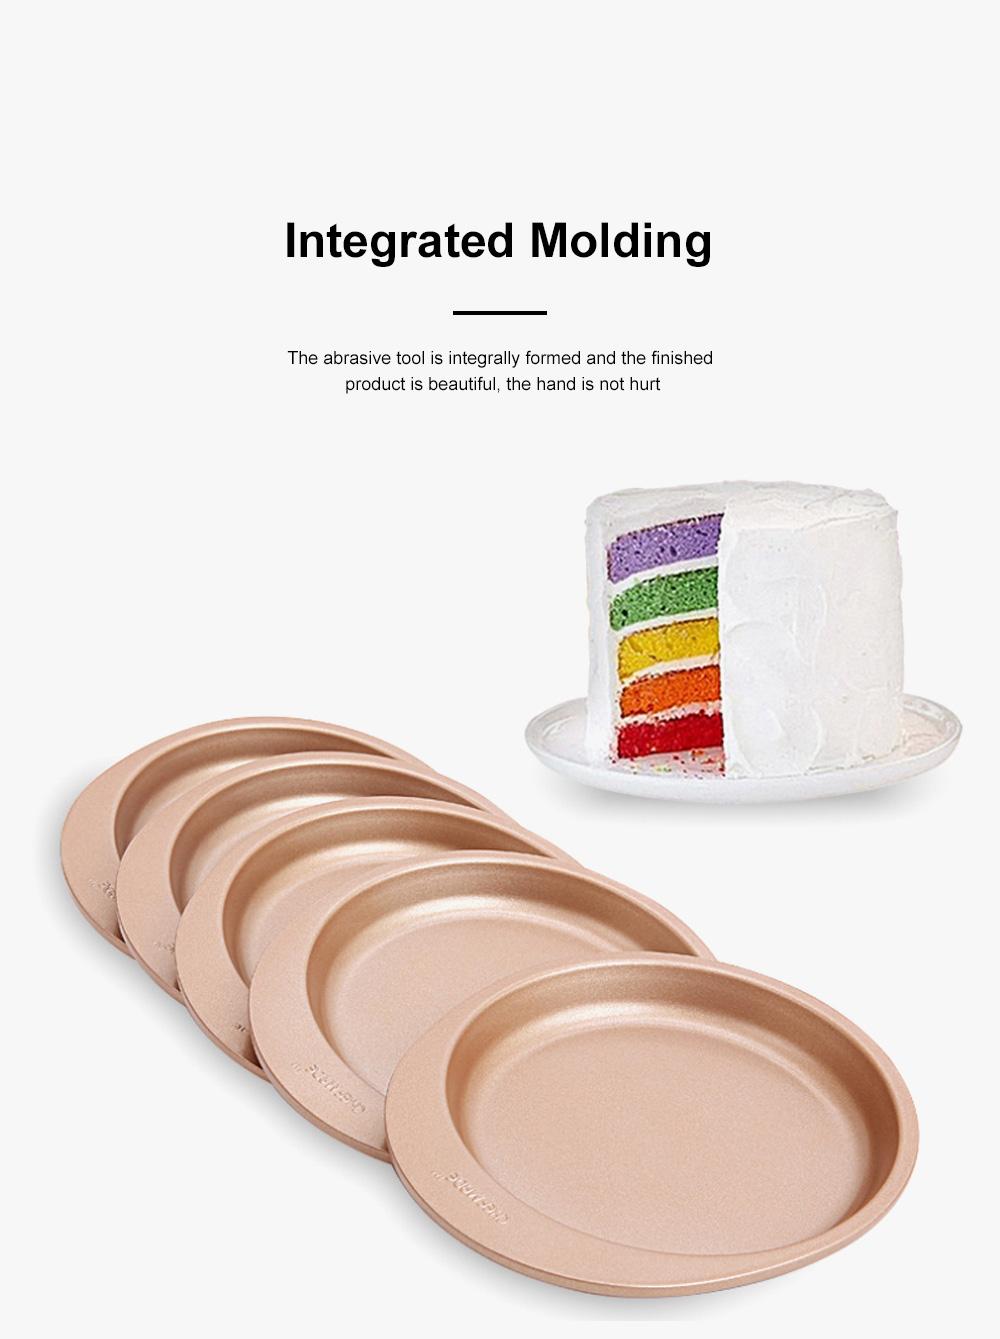 Chefmade Silicone Rainbow Cake Mould Bakeware Round DIY Baking Pan Silicone Cake Pans For Baking 5pcs 2